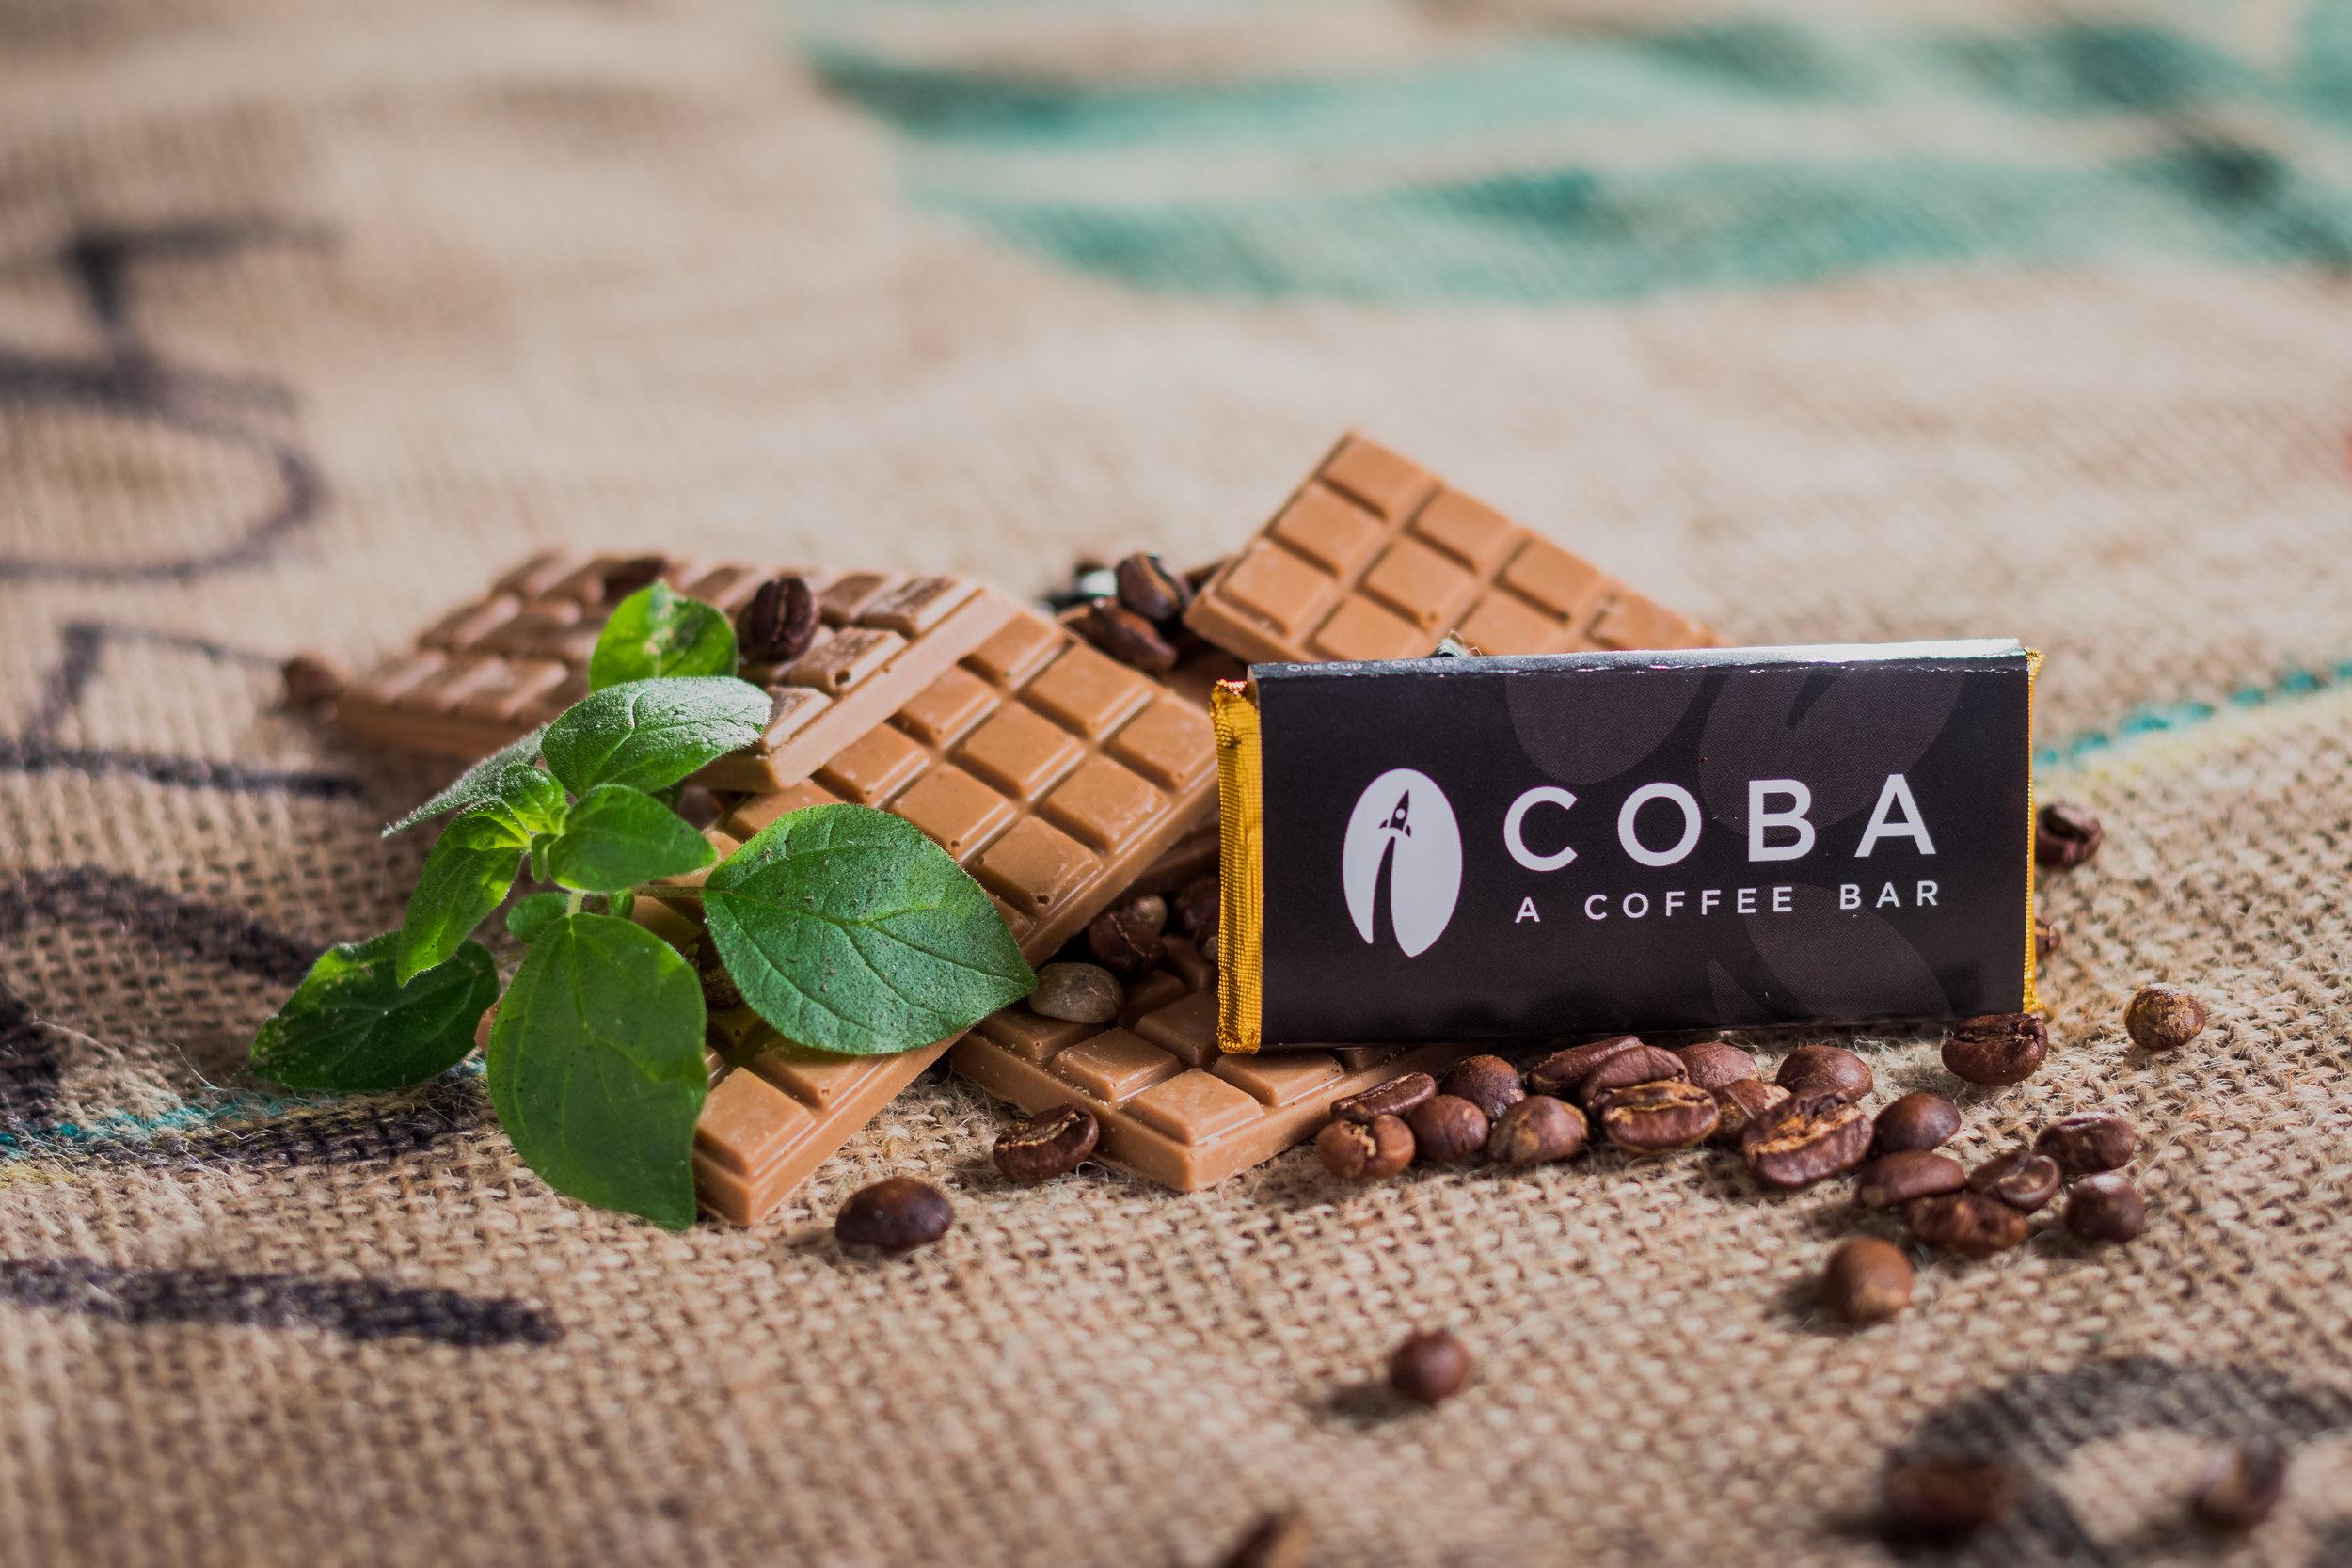 2018 08 12 CoBa Marketing Photos_-25.jpg